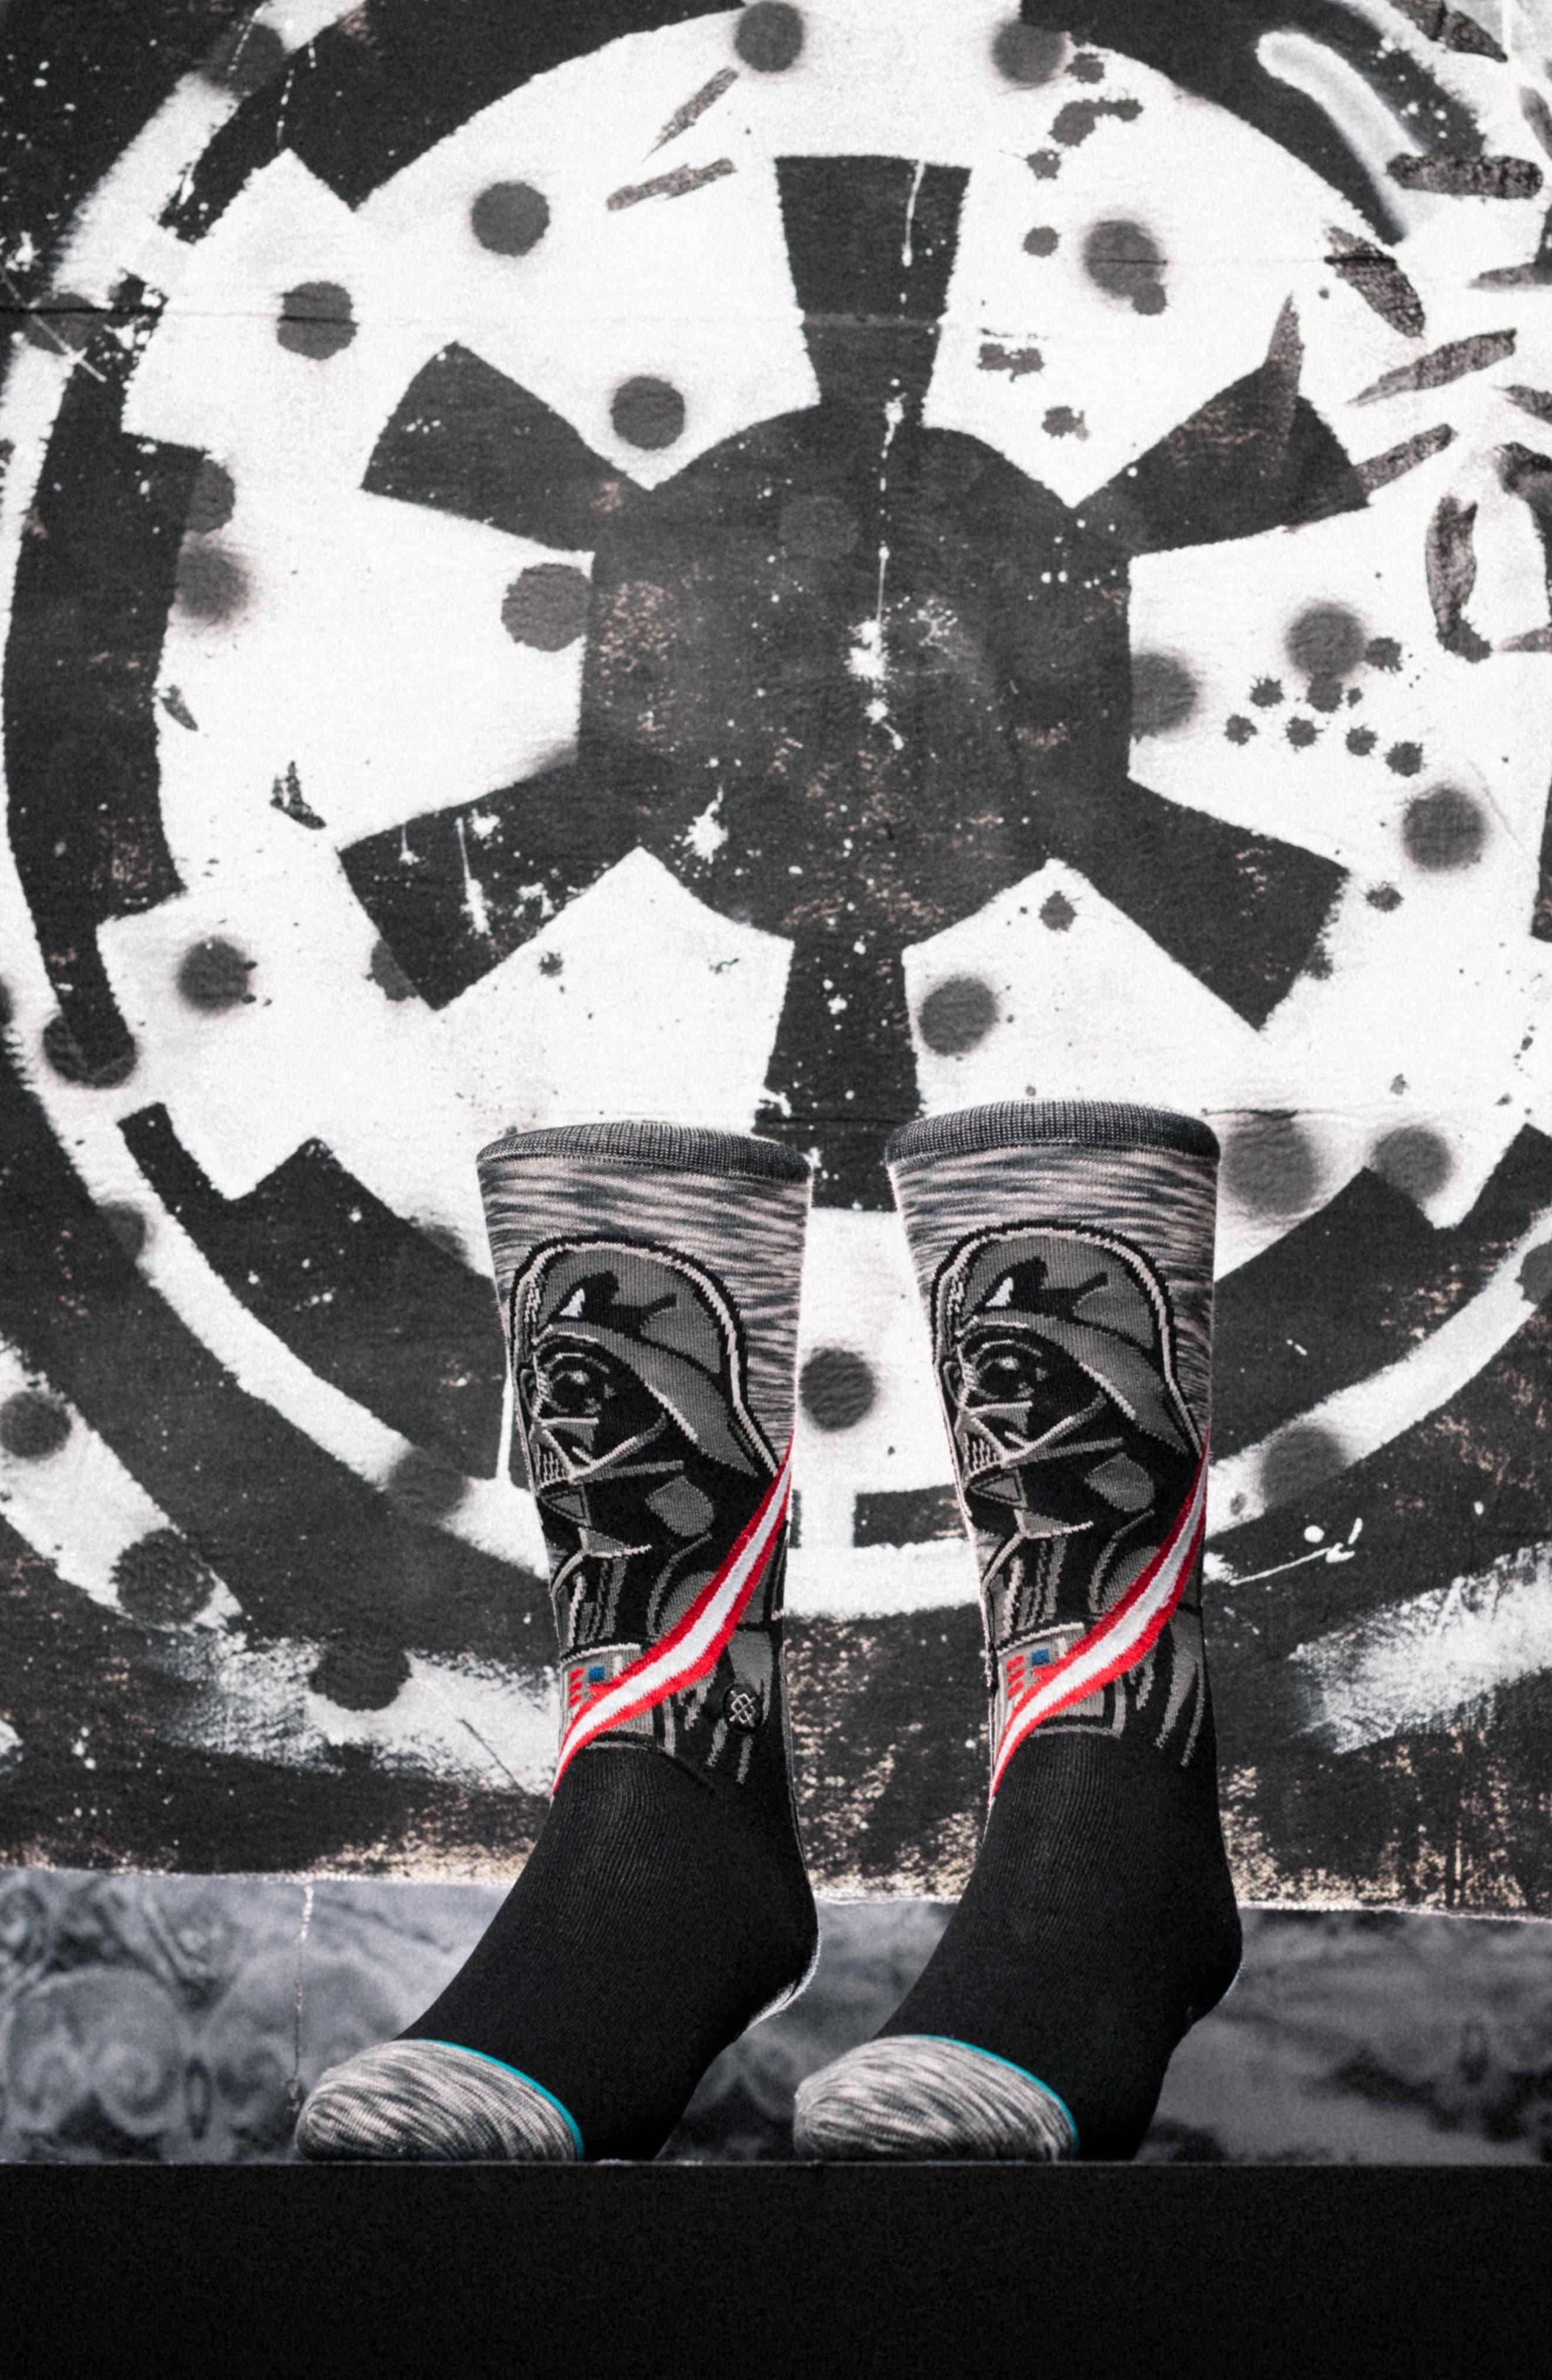 Star Wars<sup>™</sup> 6-Pack Sock Gift Set,                             Alternate thumbnail 4, color,                             Grey Multi